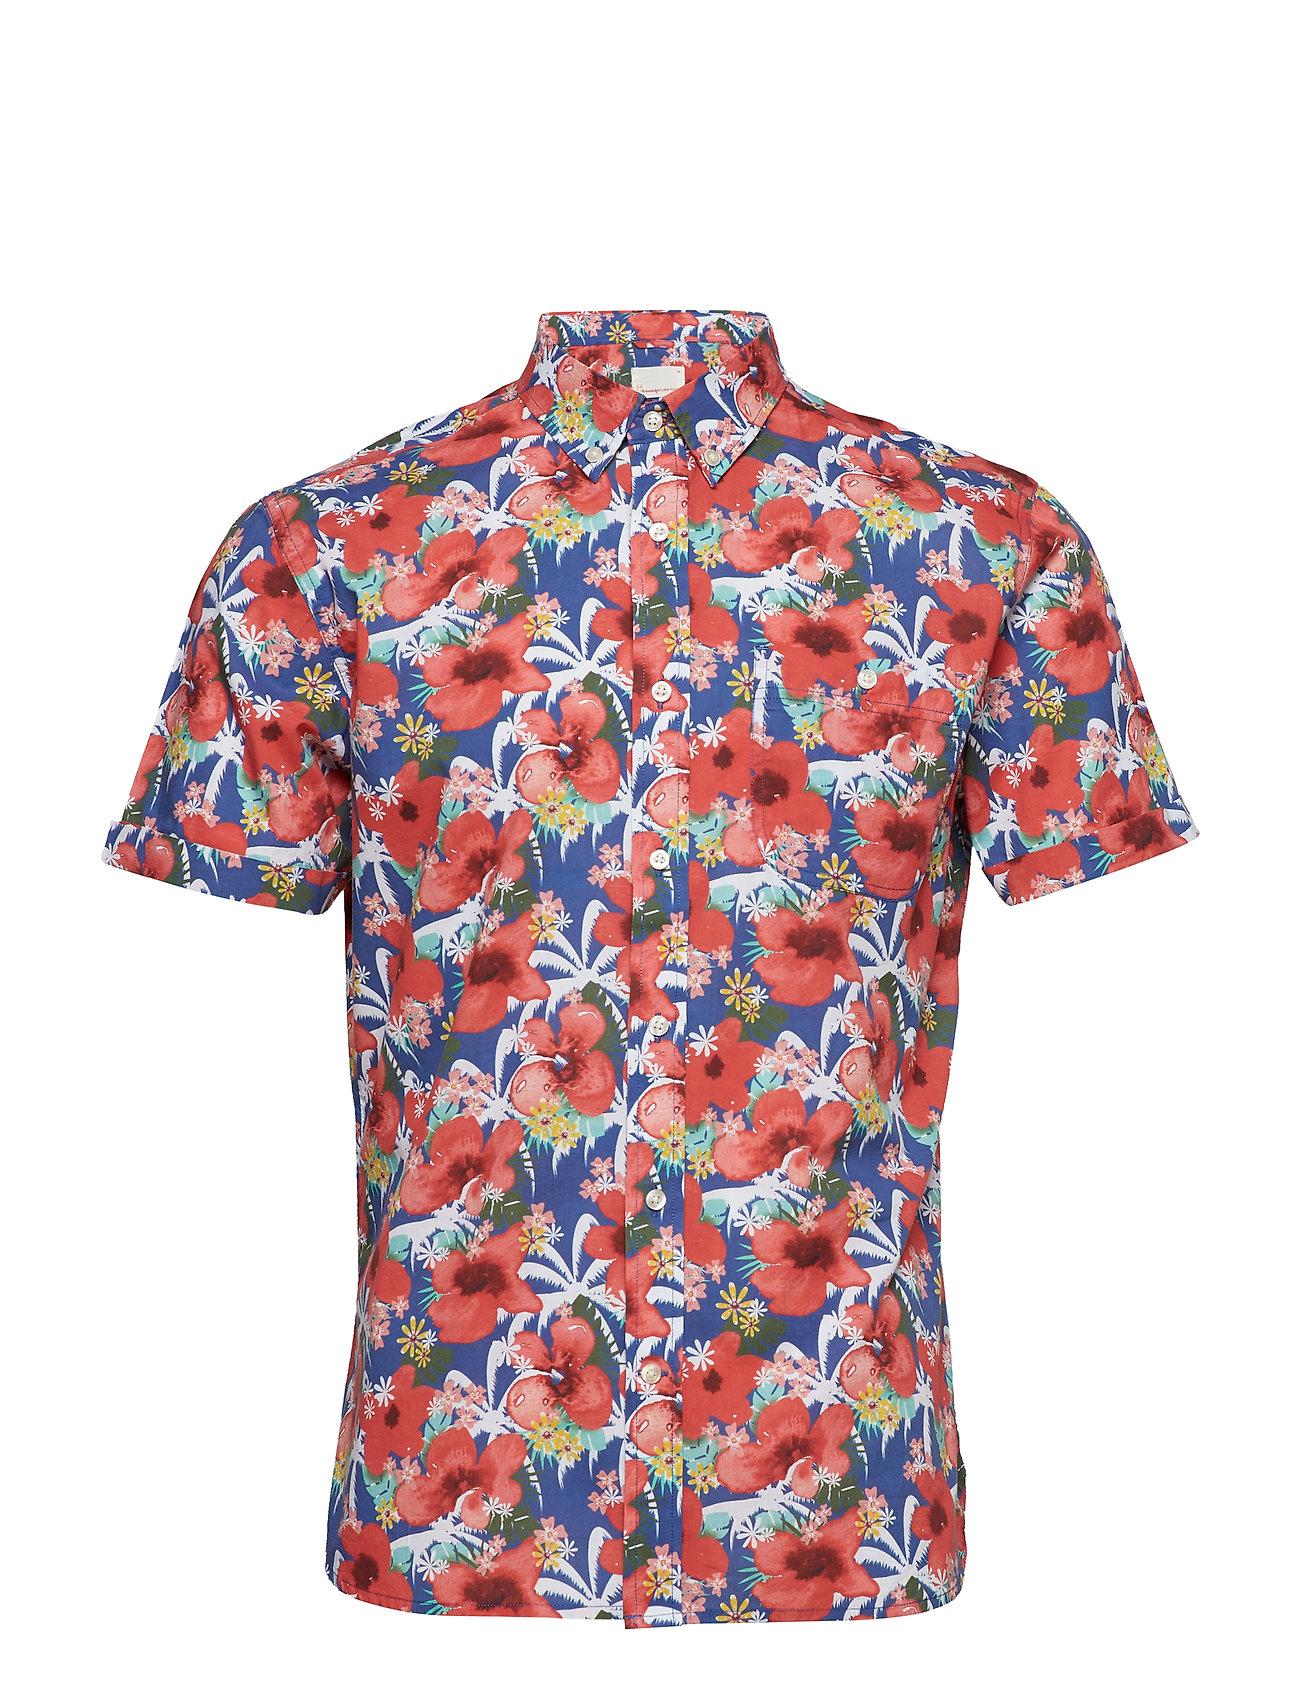 Knowledge Cotton Apparel Light poplin shirt - short sleeved